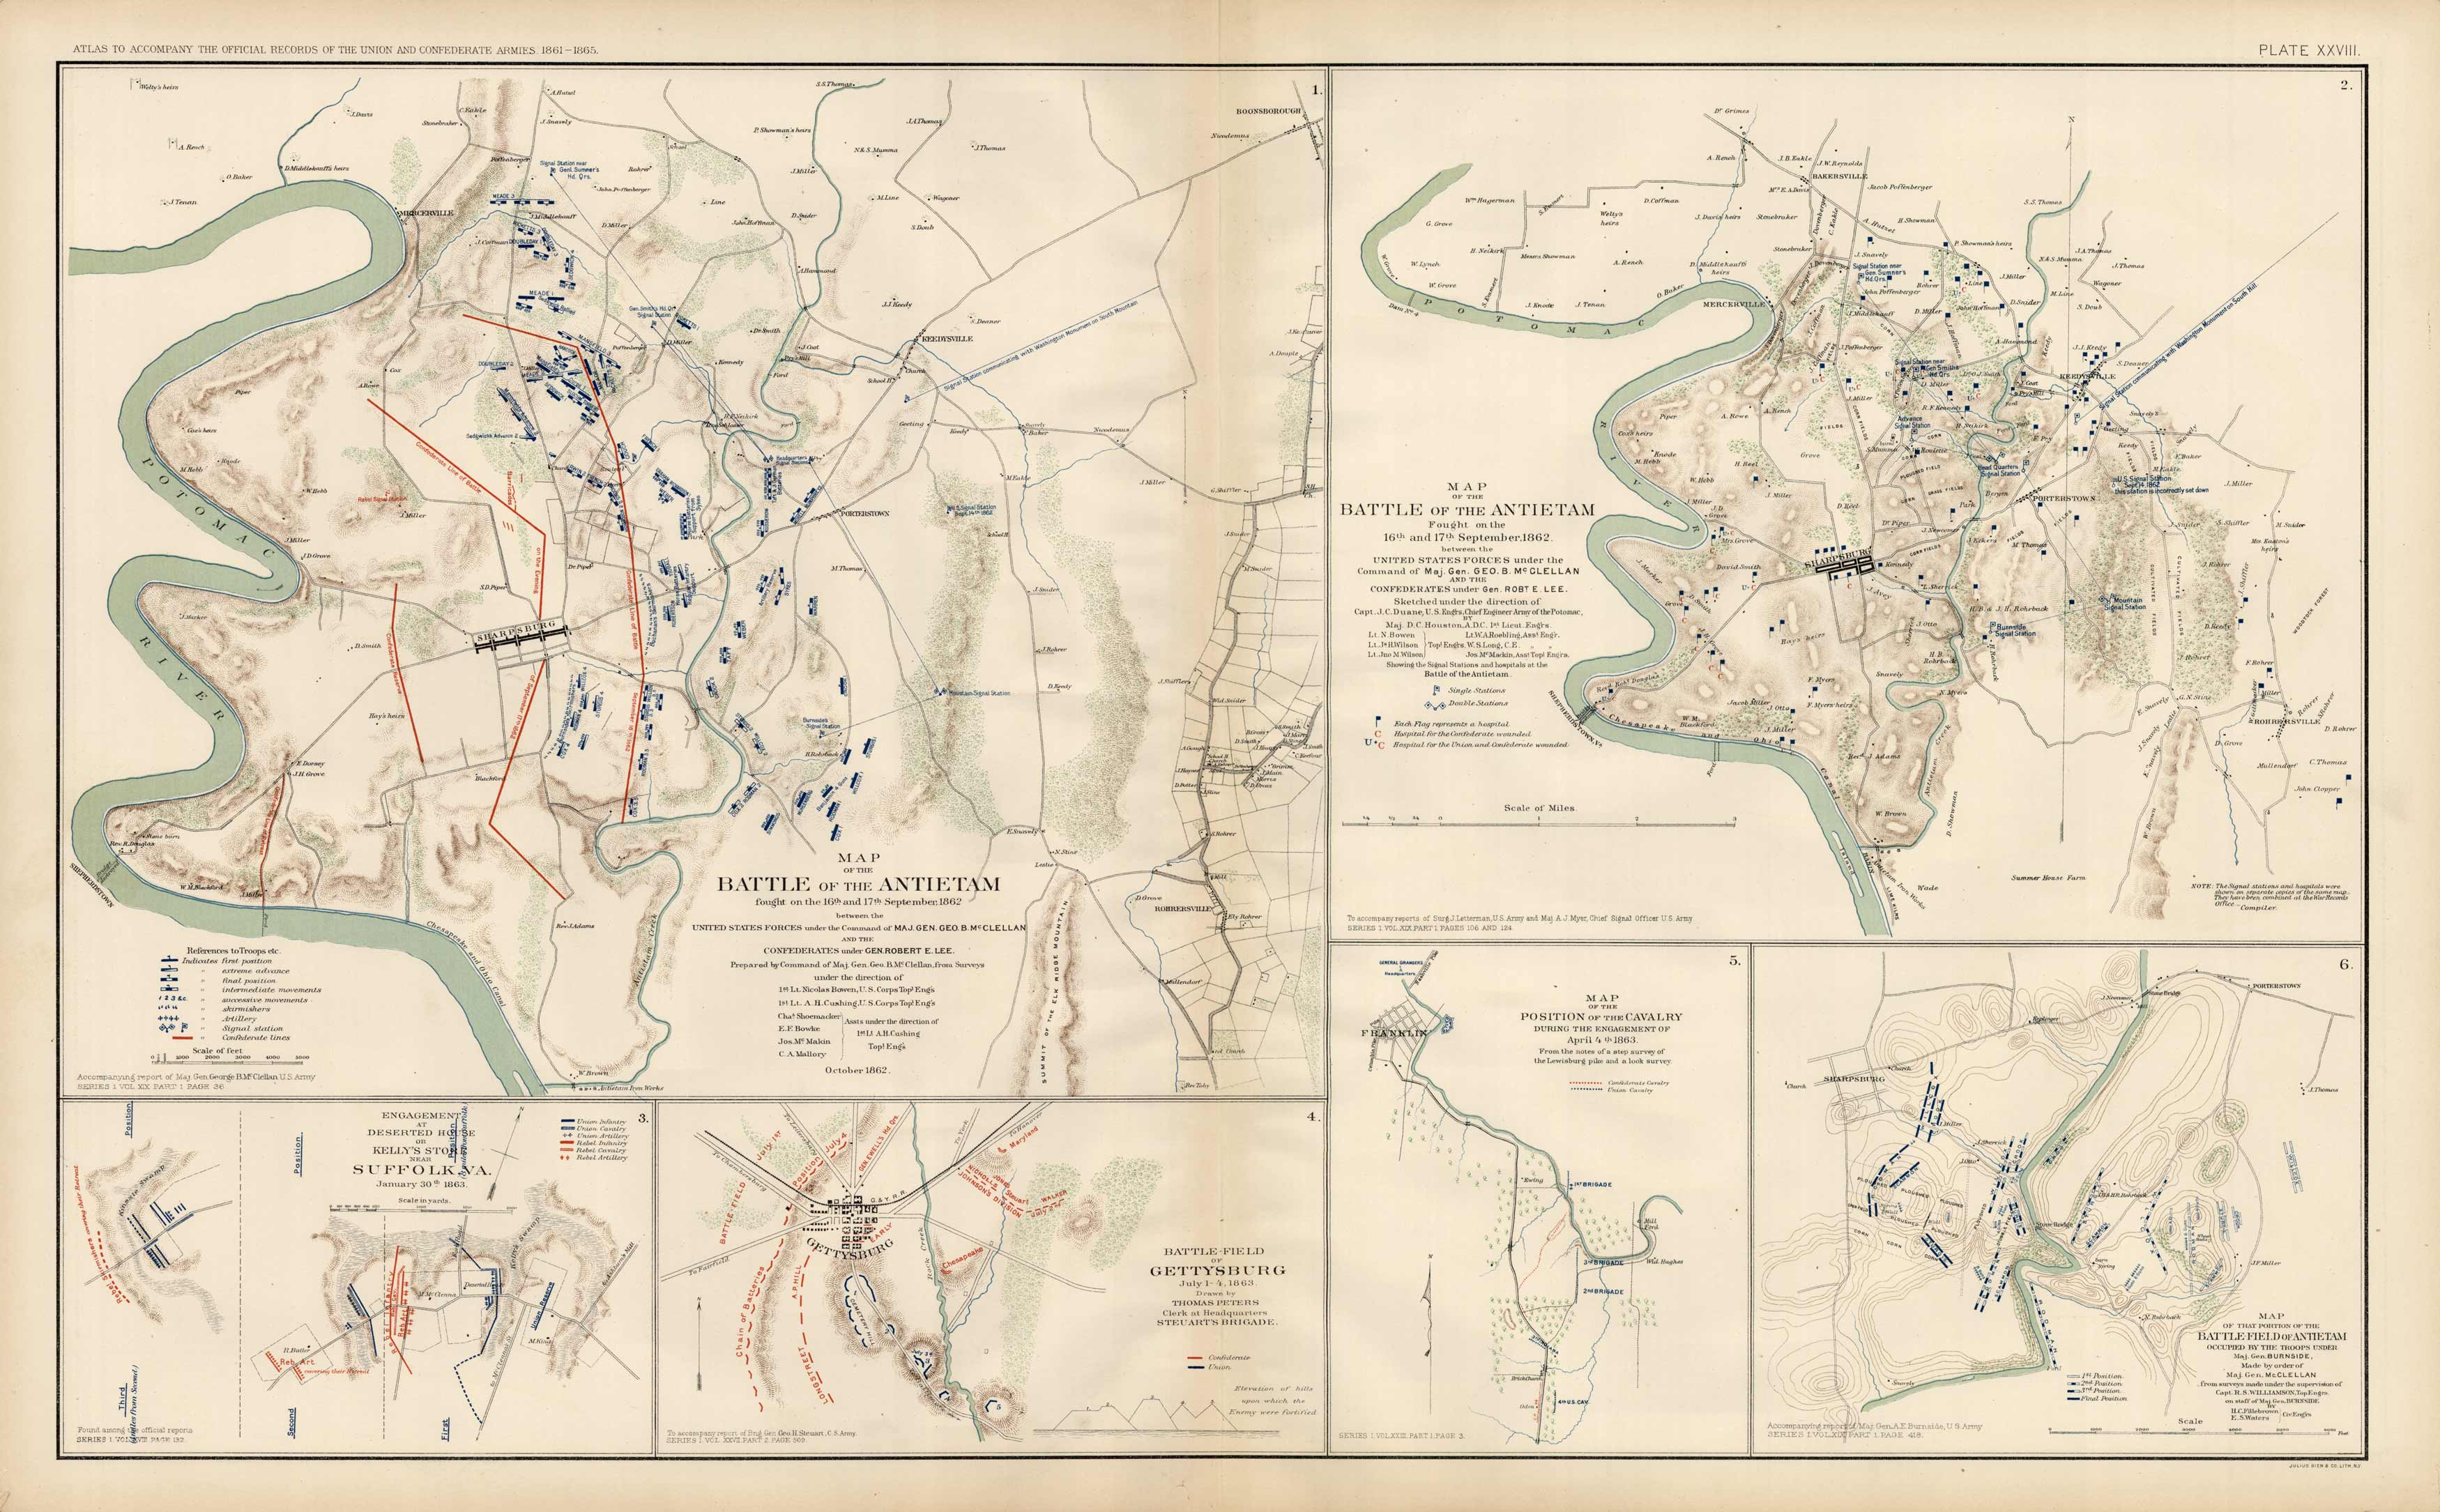 Civil War Atlas; Plate 28; Map of the Battles of Gettysburg and Antietam